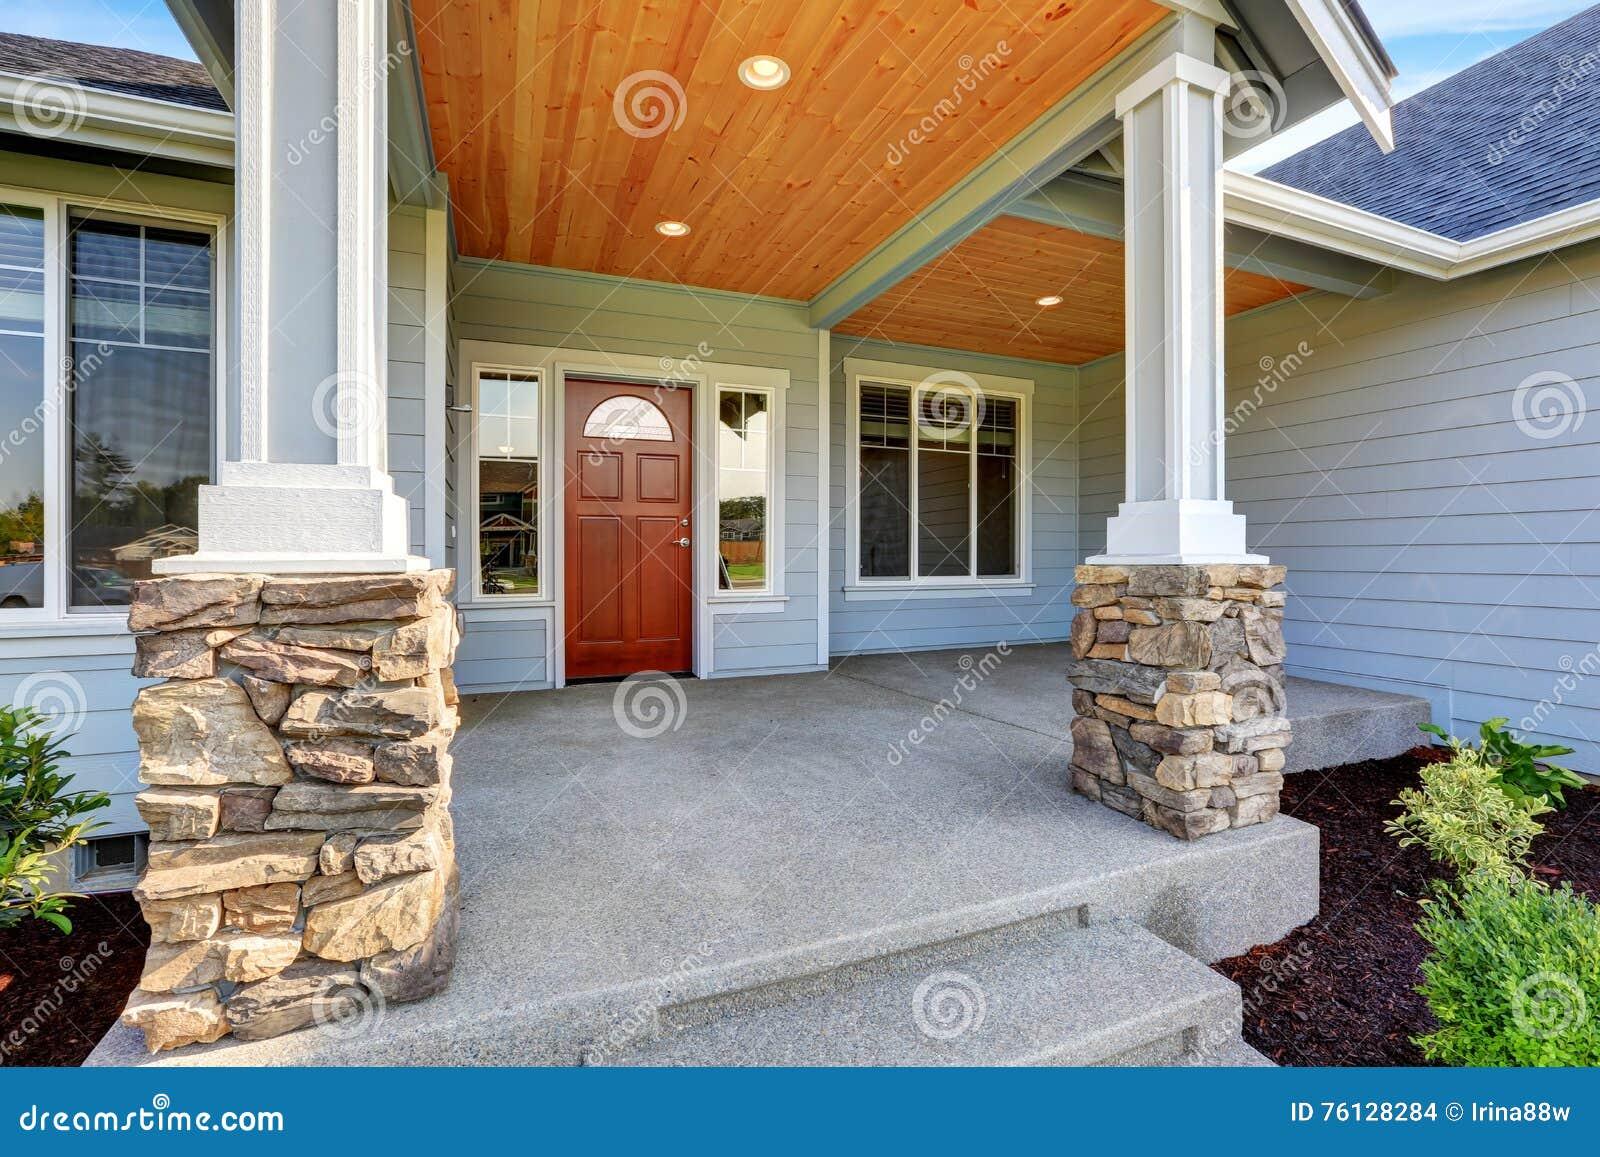 Light Blue Siding House Porch With Stone Base Columns Stock Photo Image Of Stone